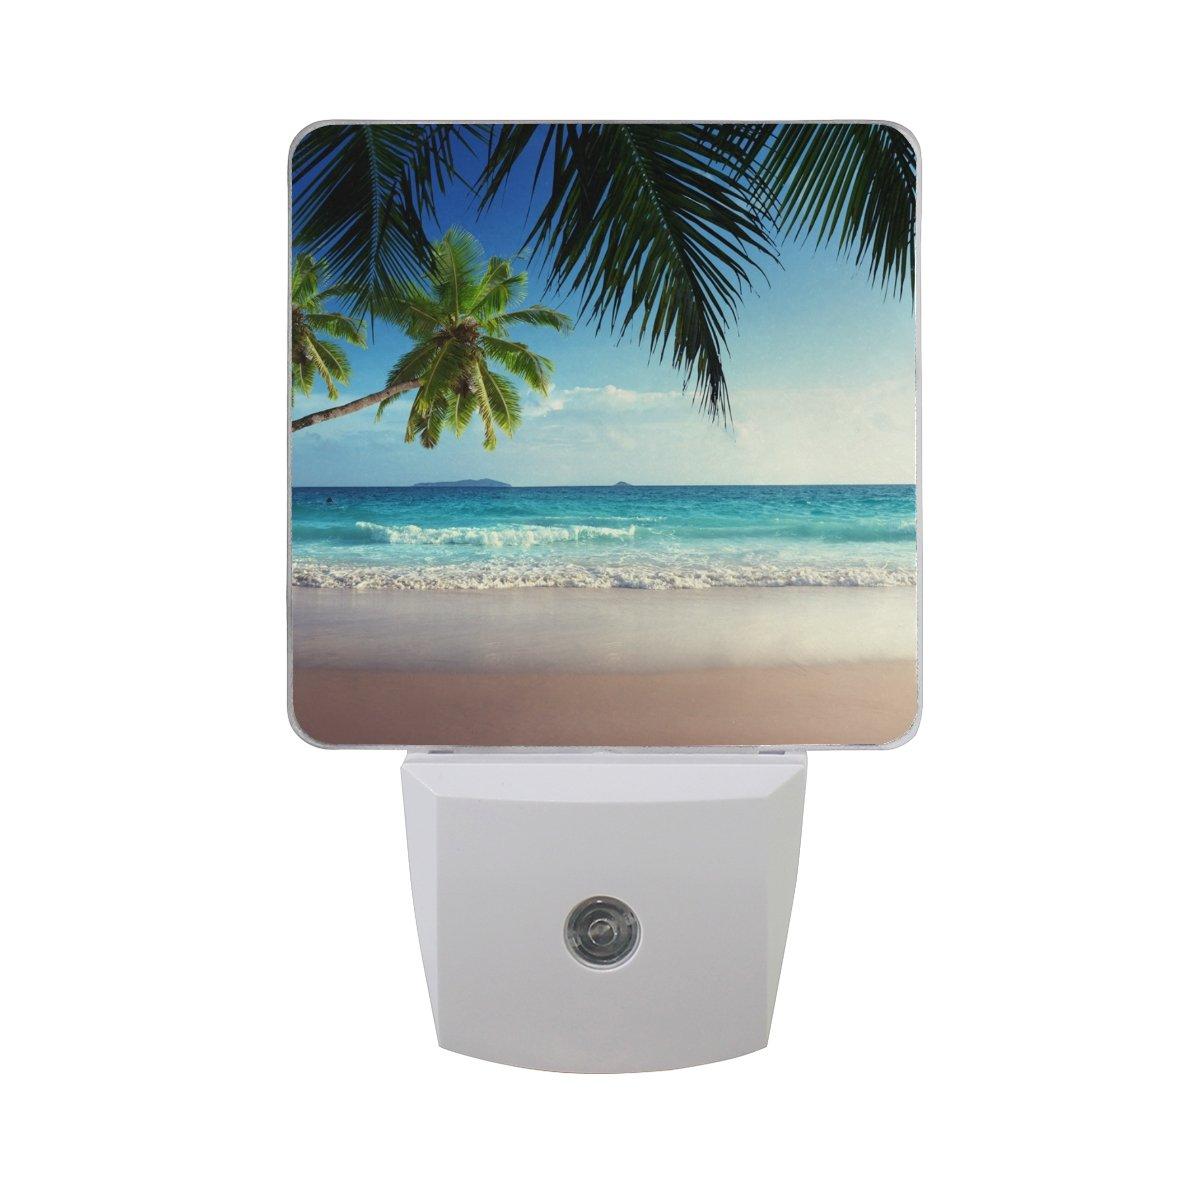 wihve夜間ライトセンサーLED Dusk to Dawn Palm Tree Beach SeawaveホワイトクラウドとブルースカイプラグインDreamベッドランプ B07D13MGYV 26559